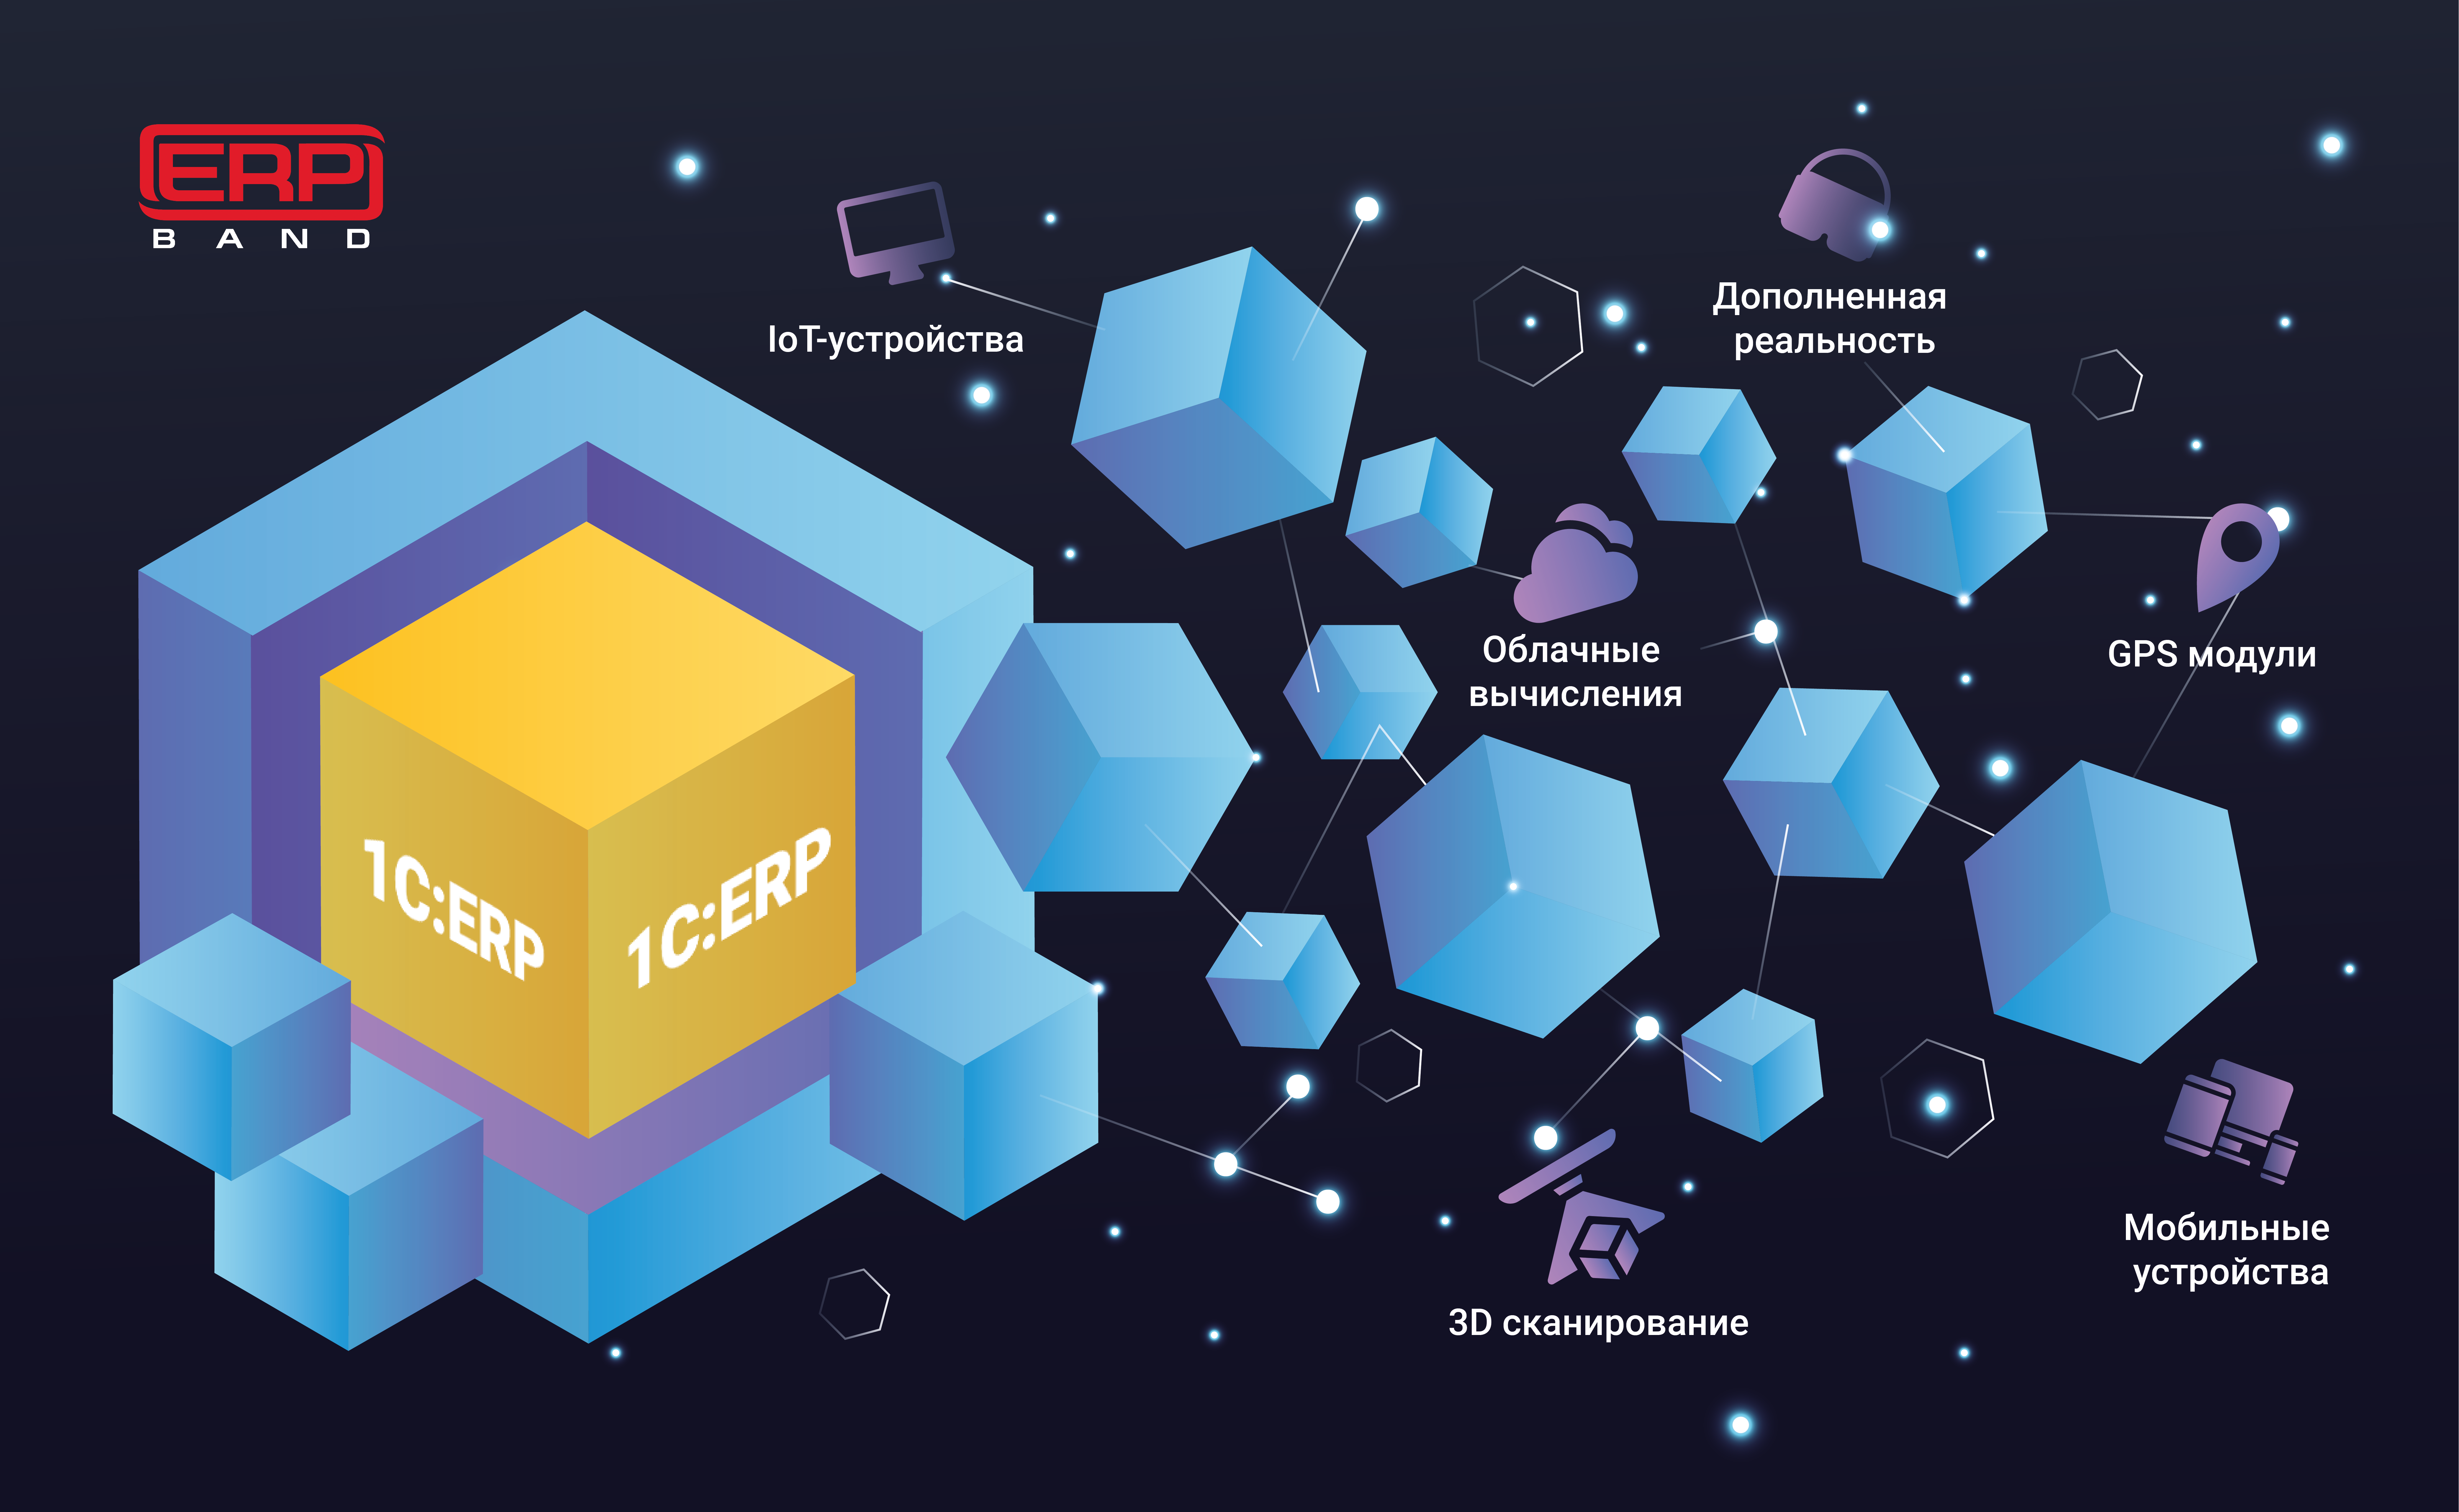 1С: ERP для Индустрии 4.0